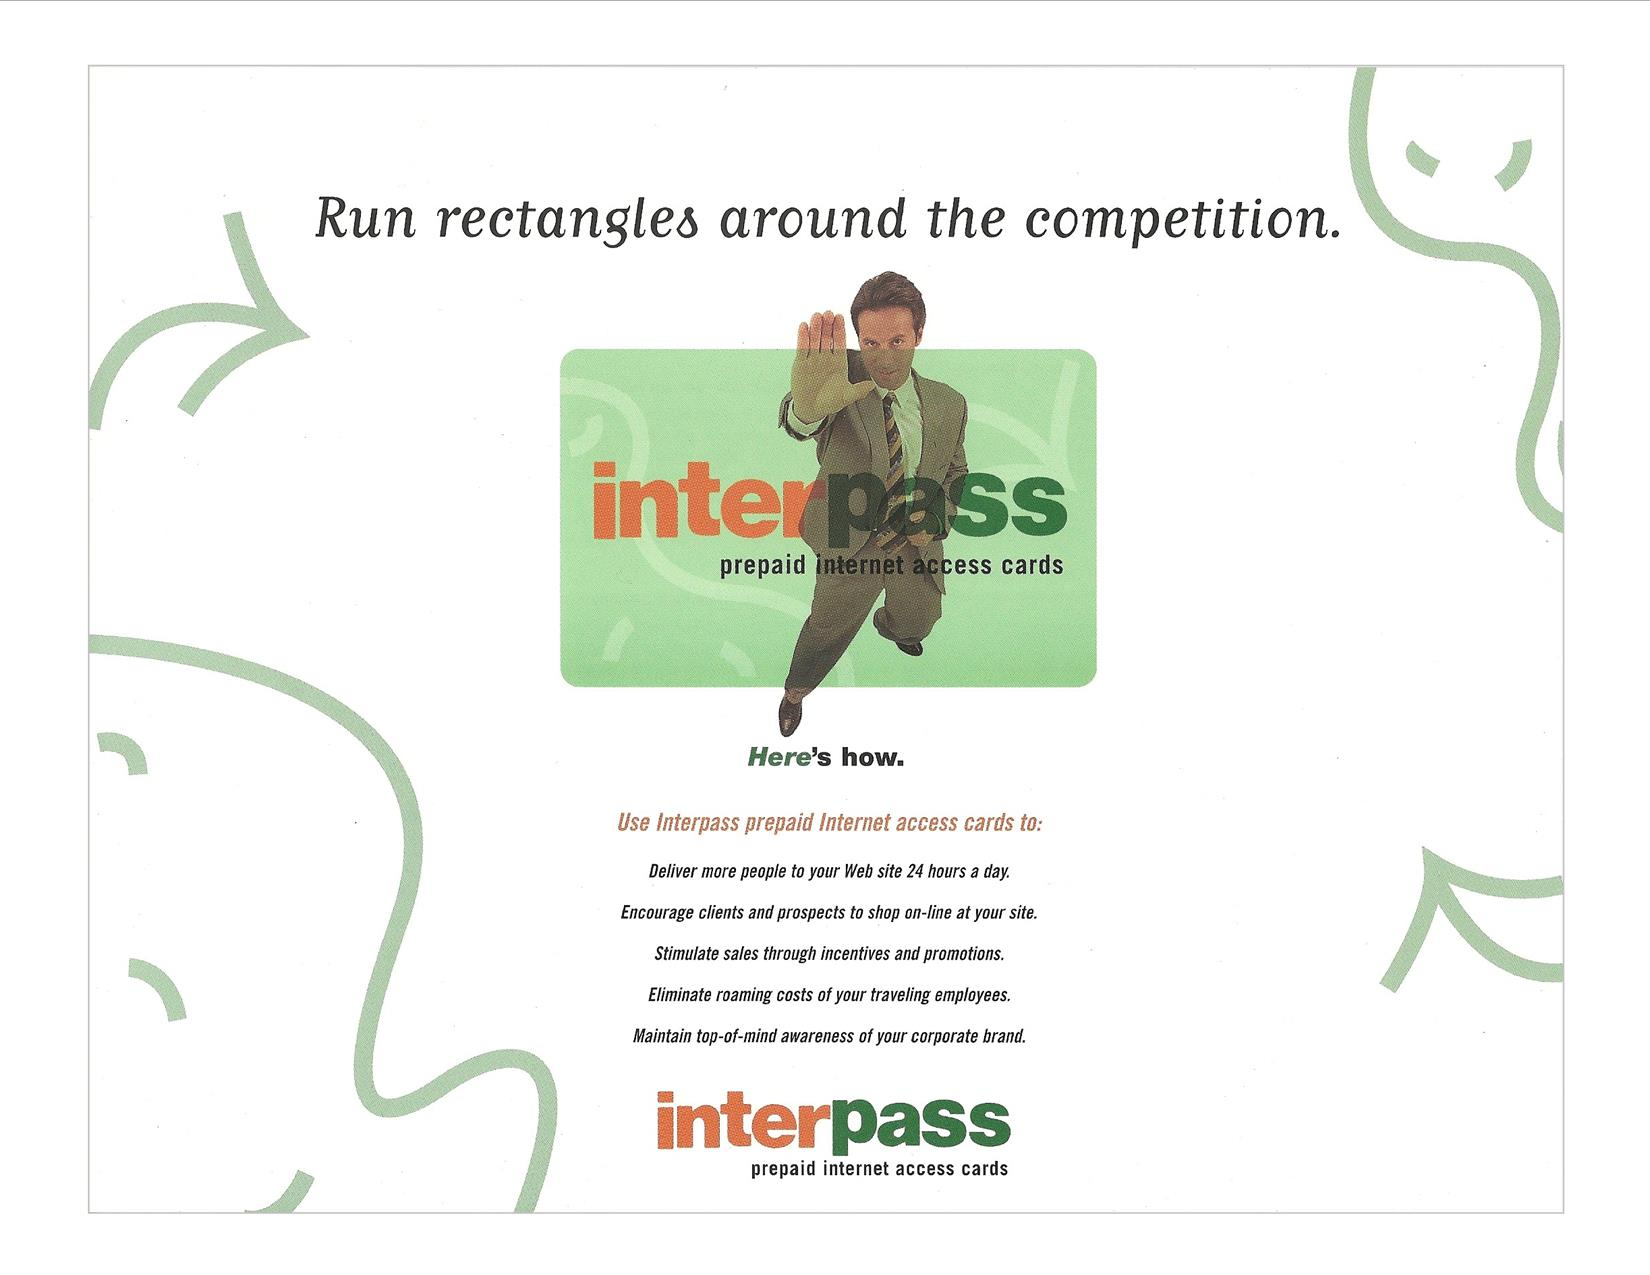 InterPass 1 of 2